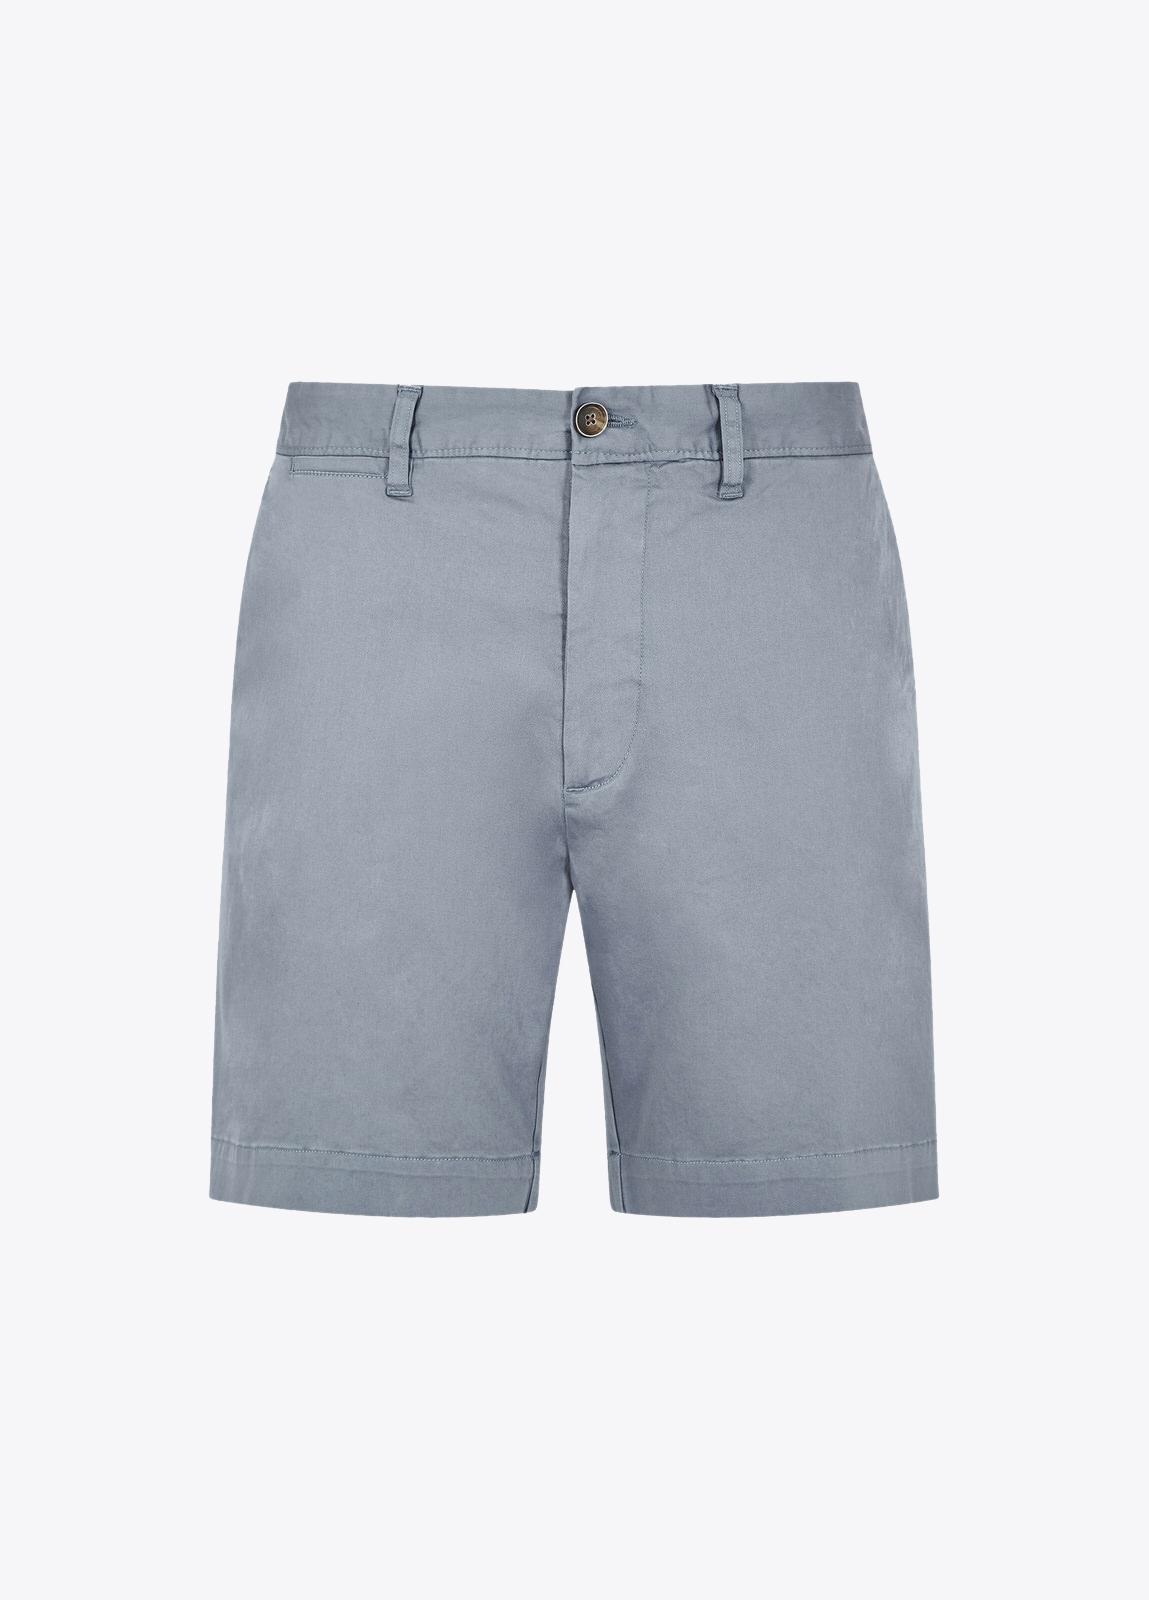 Delphi Shorts - Denim